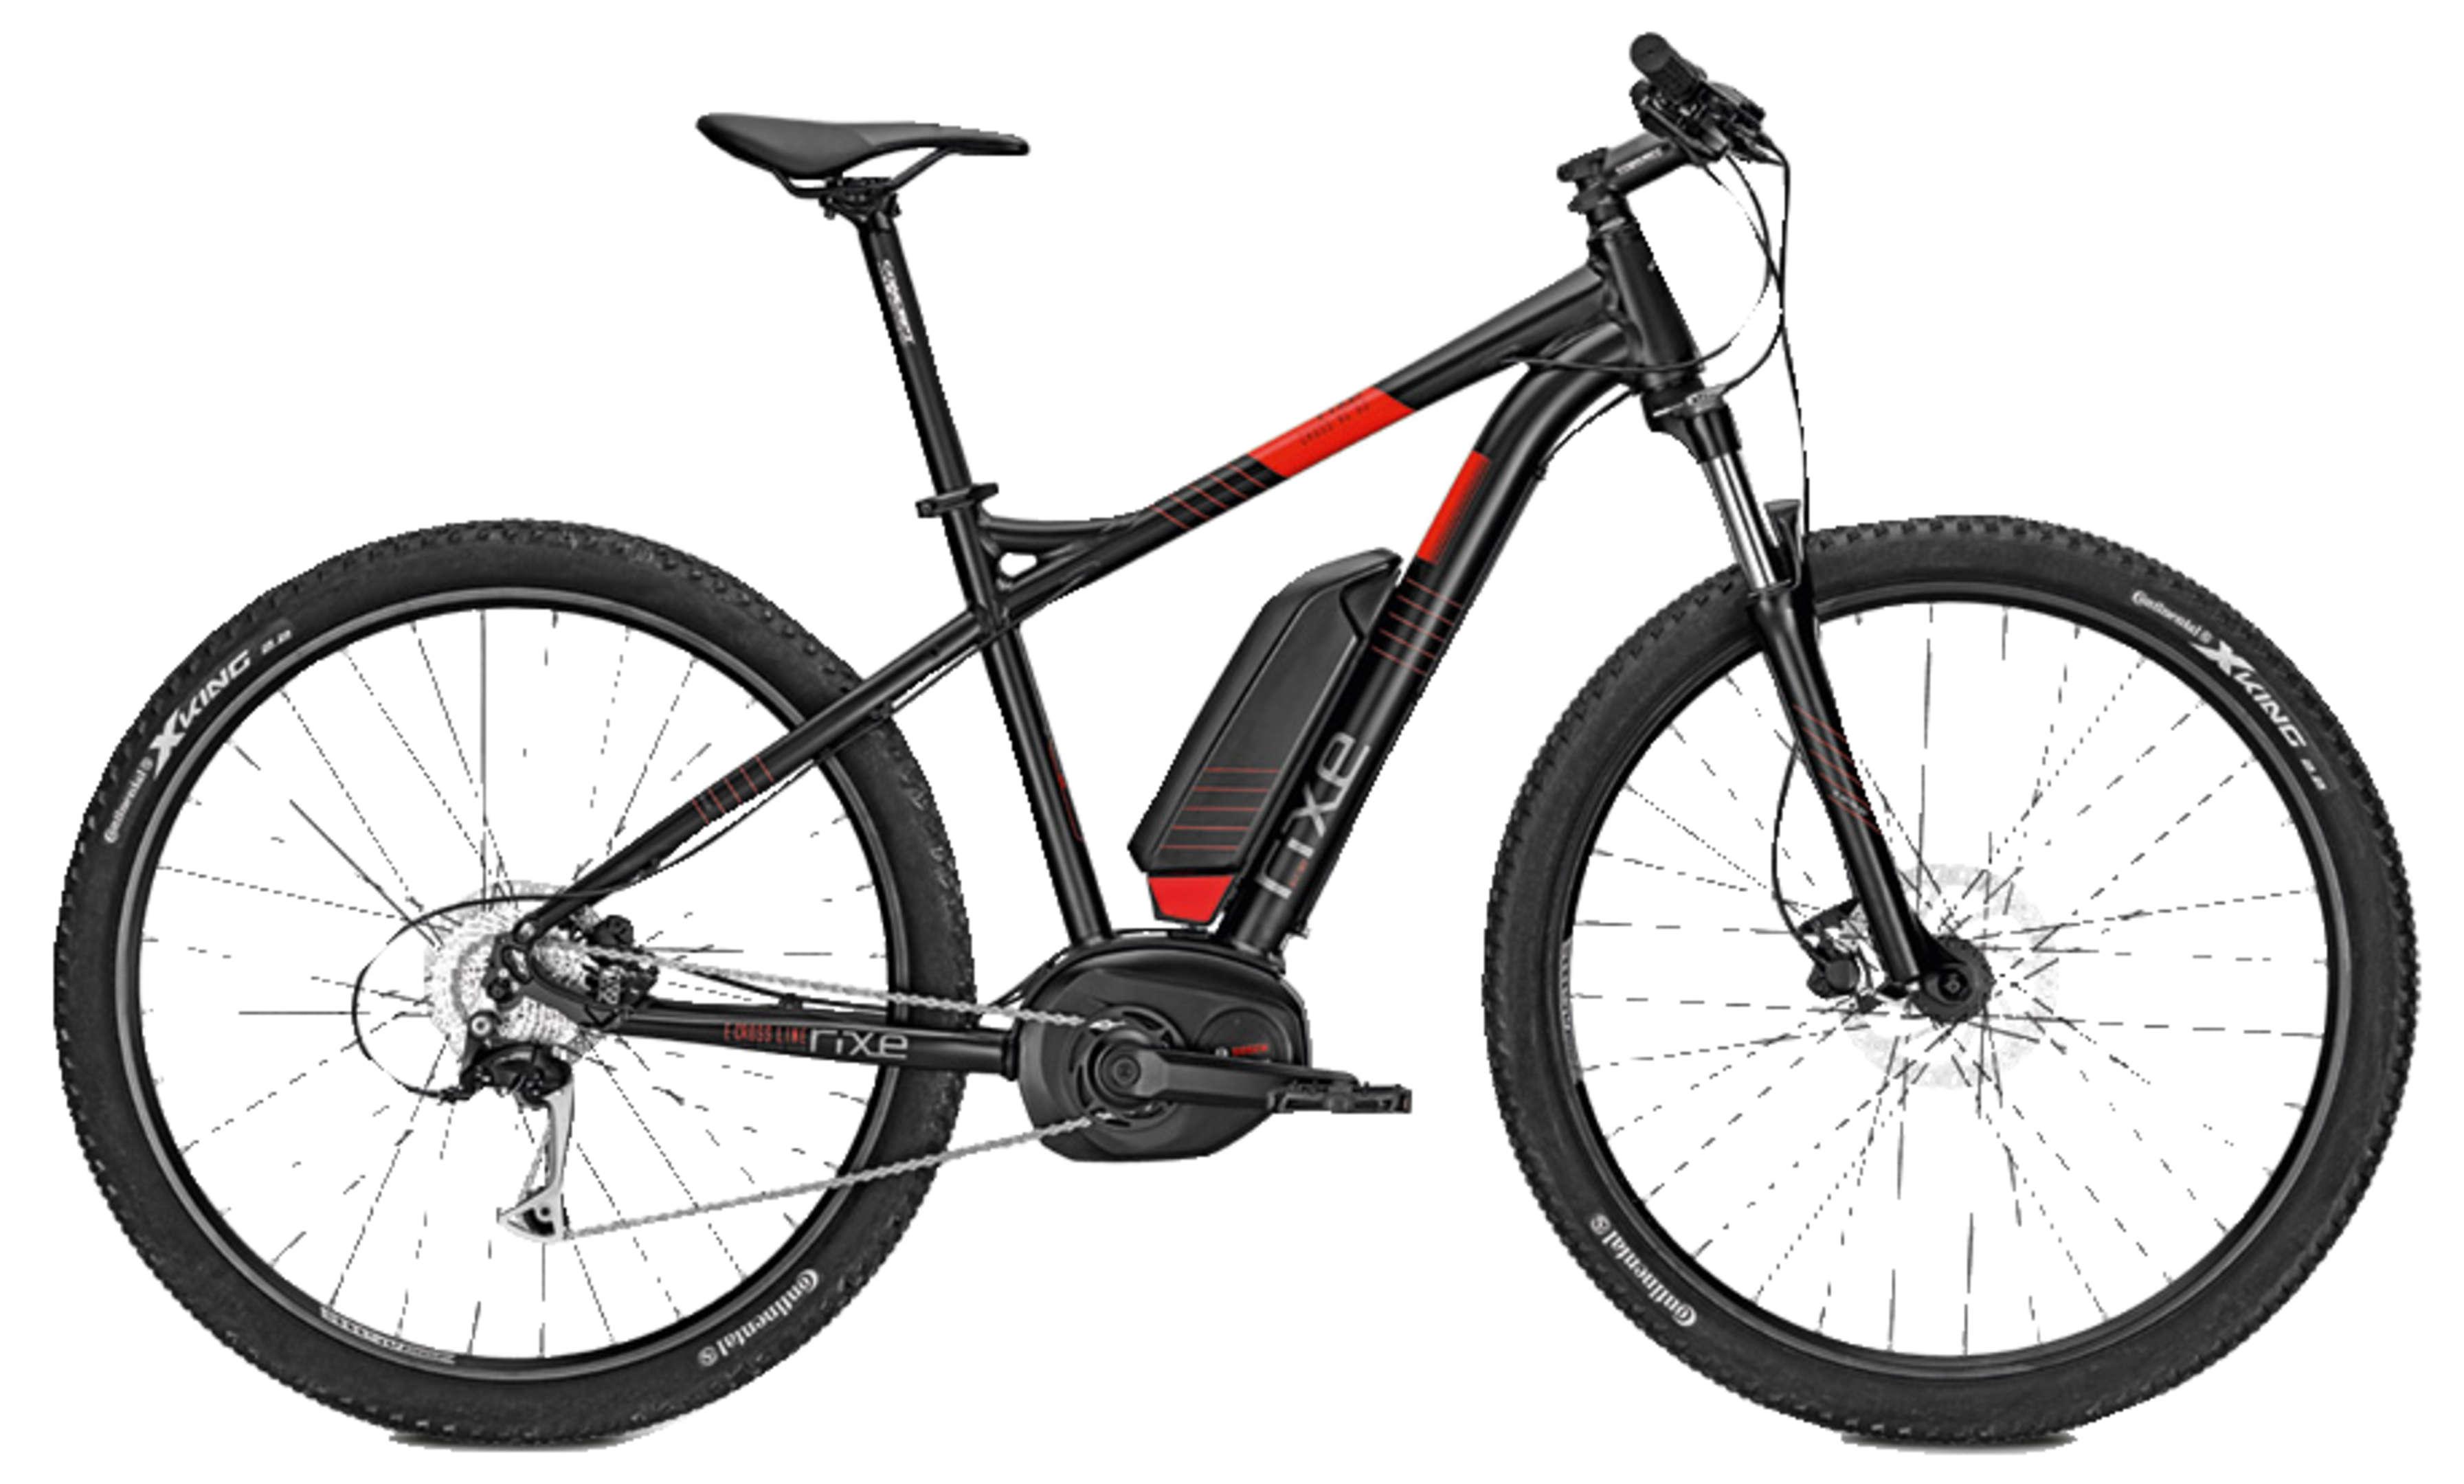 rixe e bike cross xc b9 eurorad bikeleasingeurorad. Black Bedroom Furniture Sets. Home Design Ideas